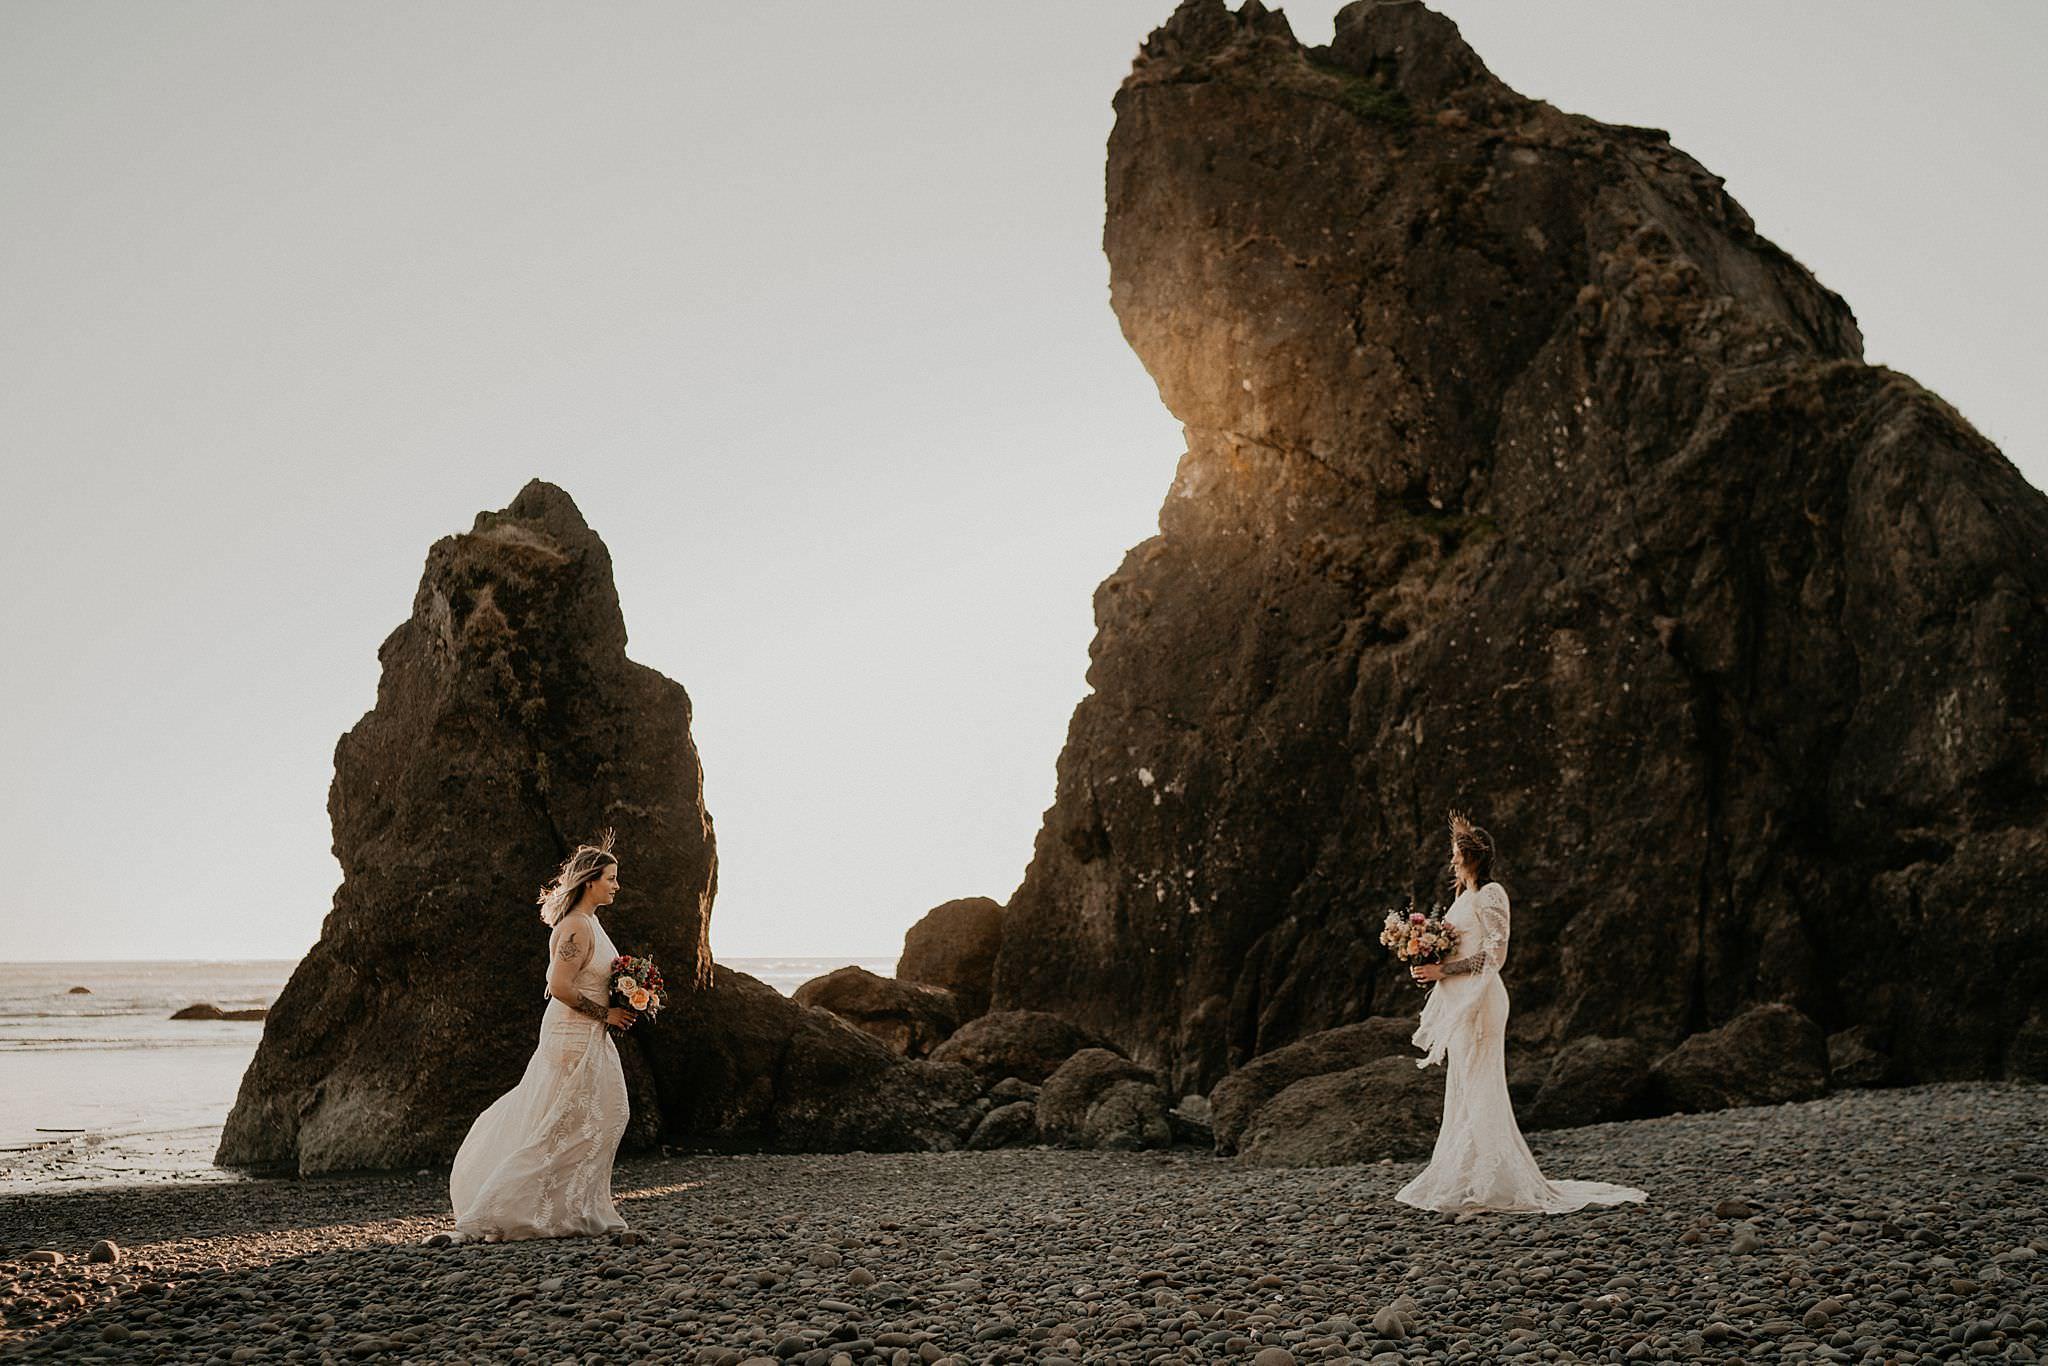 Lesbian brides at Ruby Beach elopement wearing bohemian Rue de seine dress from Seattle Dress Theory